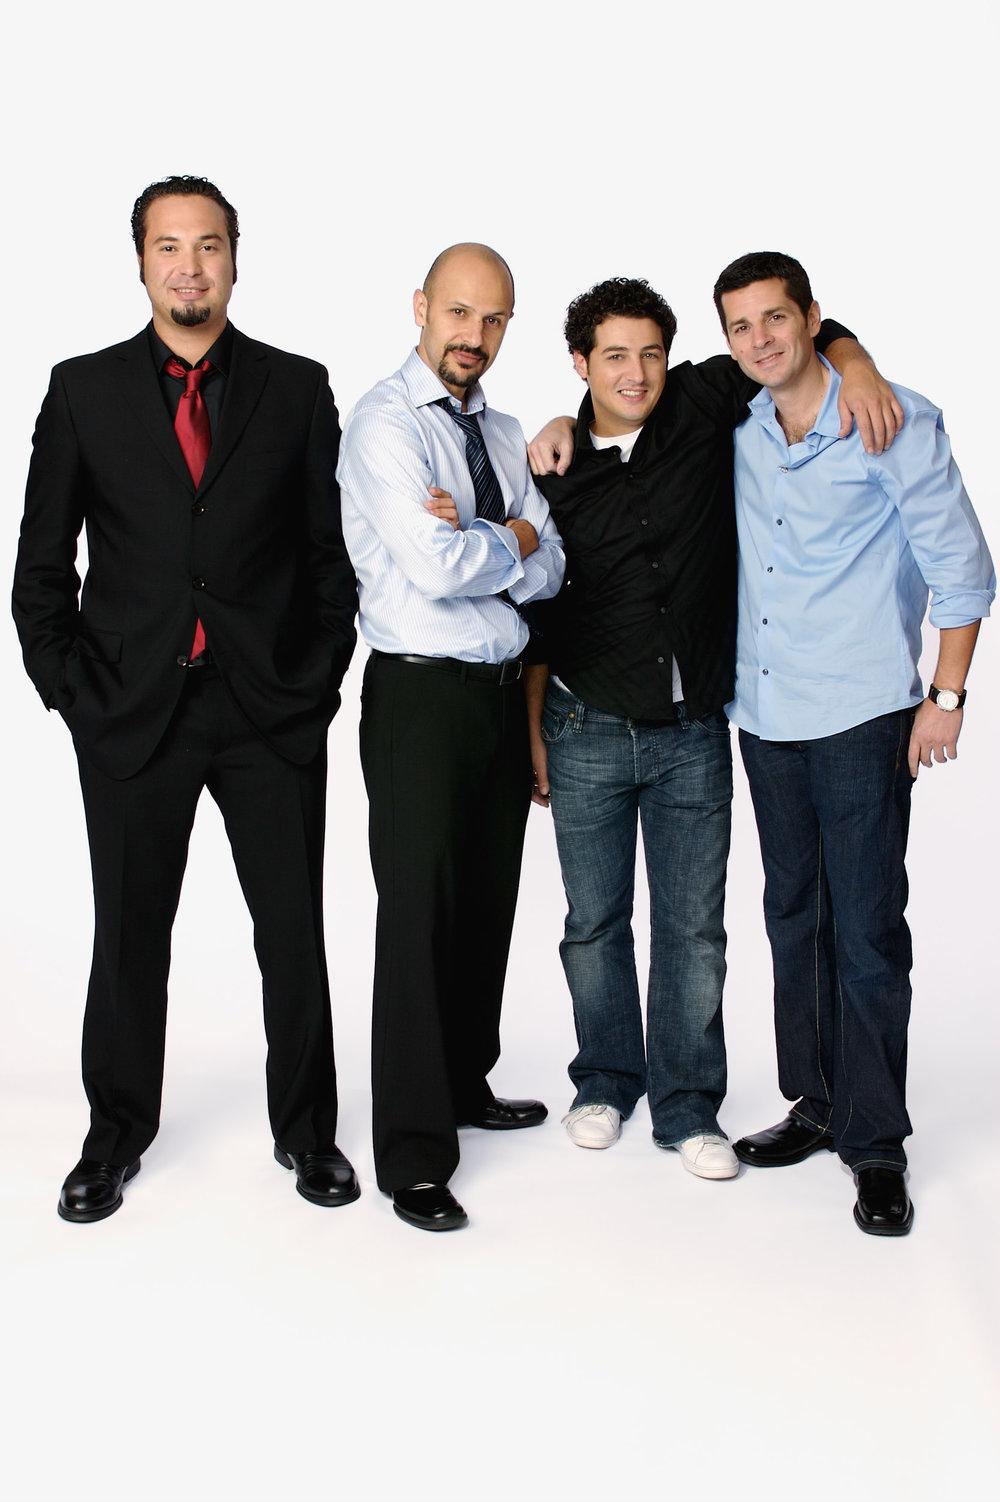 Ahmed Ahmed, Maz Jobrani, Aron Kader & Dean Obeidallah